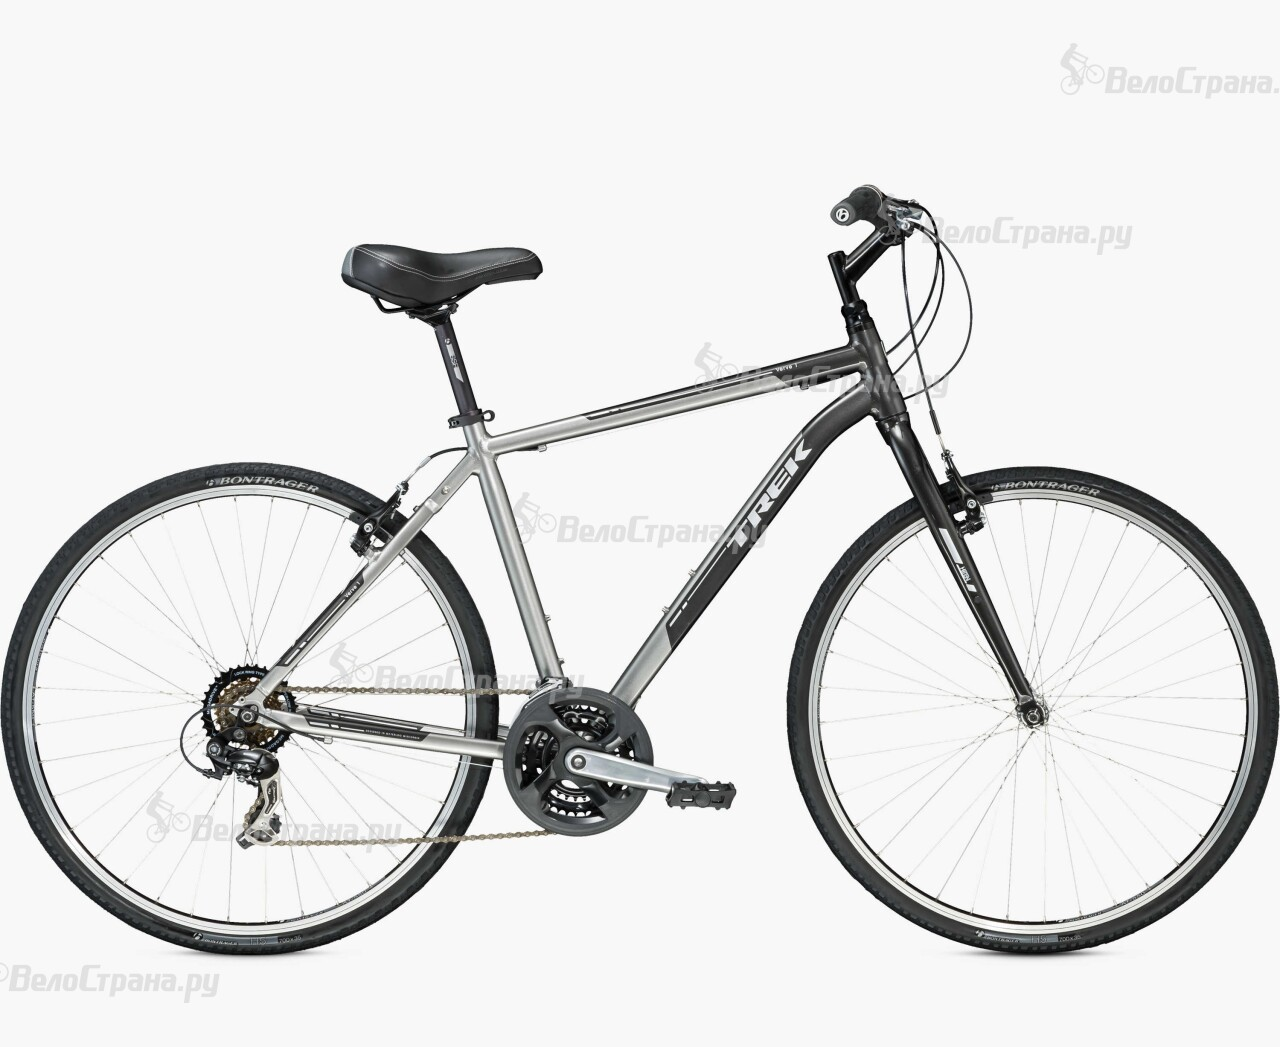 Велосипед Trek Verve 1 (2016) велосипед trek verve 2 2014